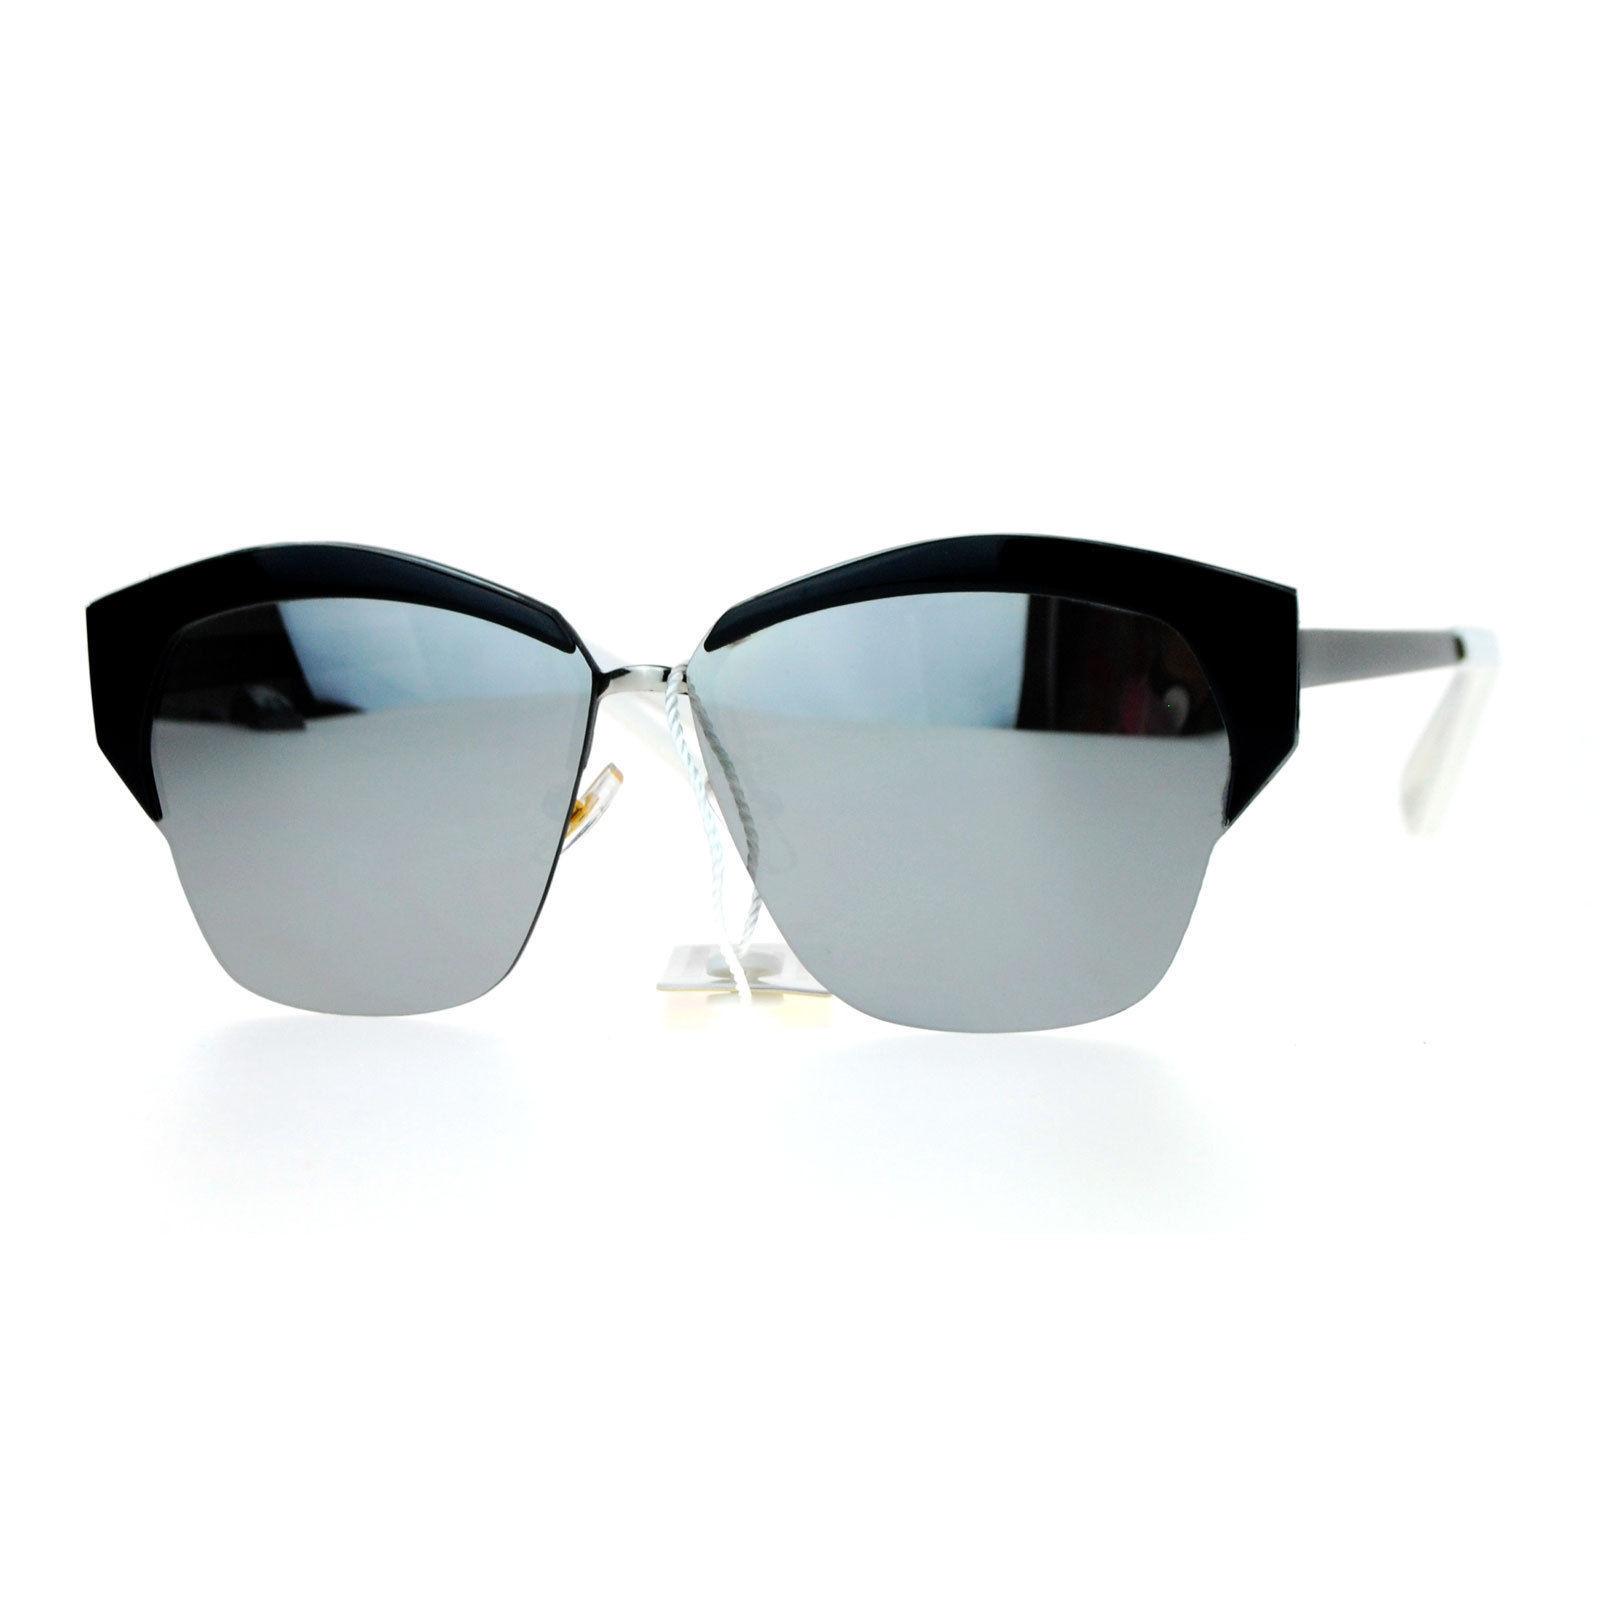 Womens Designer Sunglasses Half Rim Metal Top Trendy Flat Lens Shades